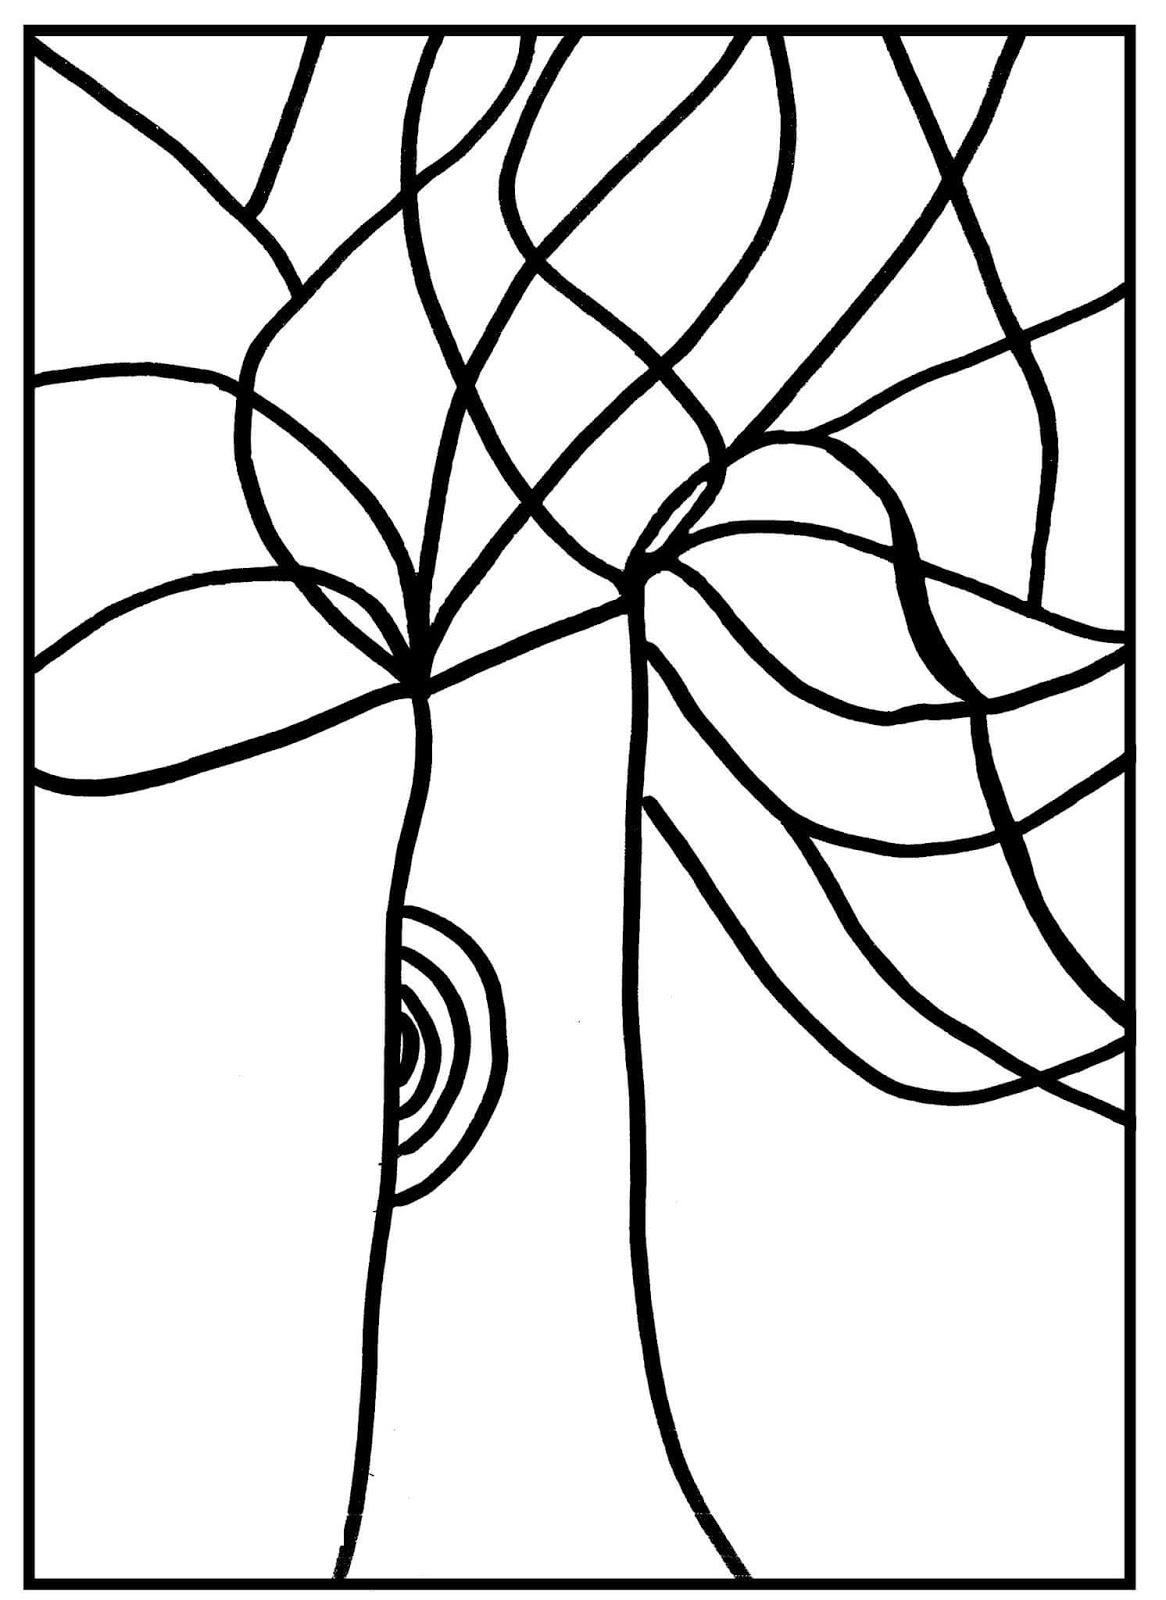 klr650 wiring diagram on 2002 pontiac bonneville fuse panel diagram